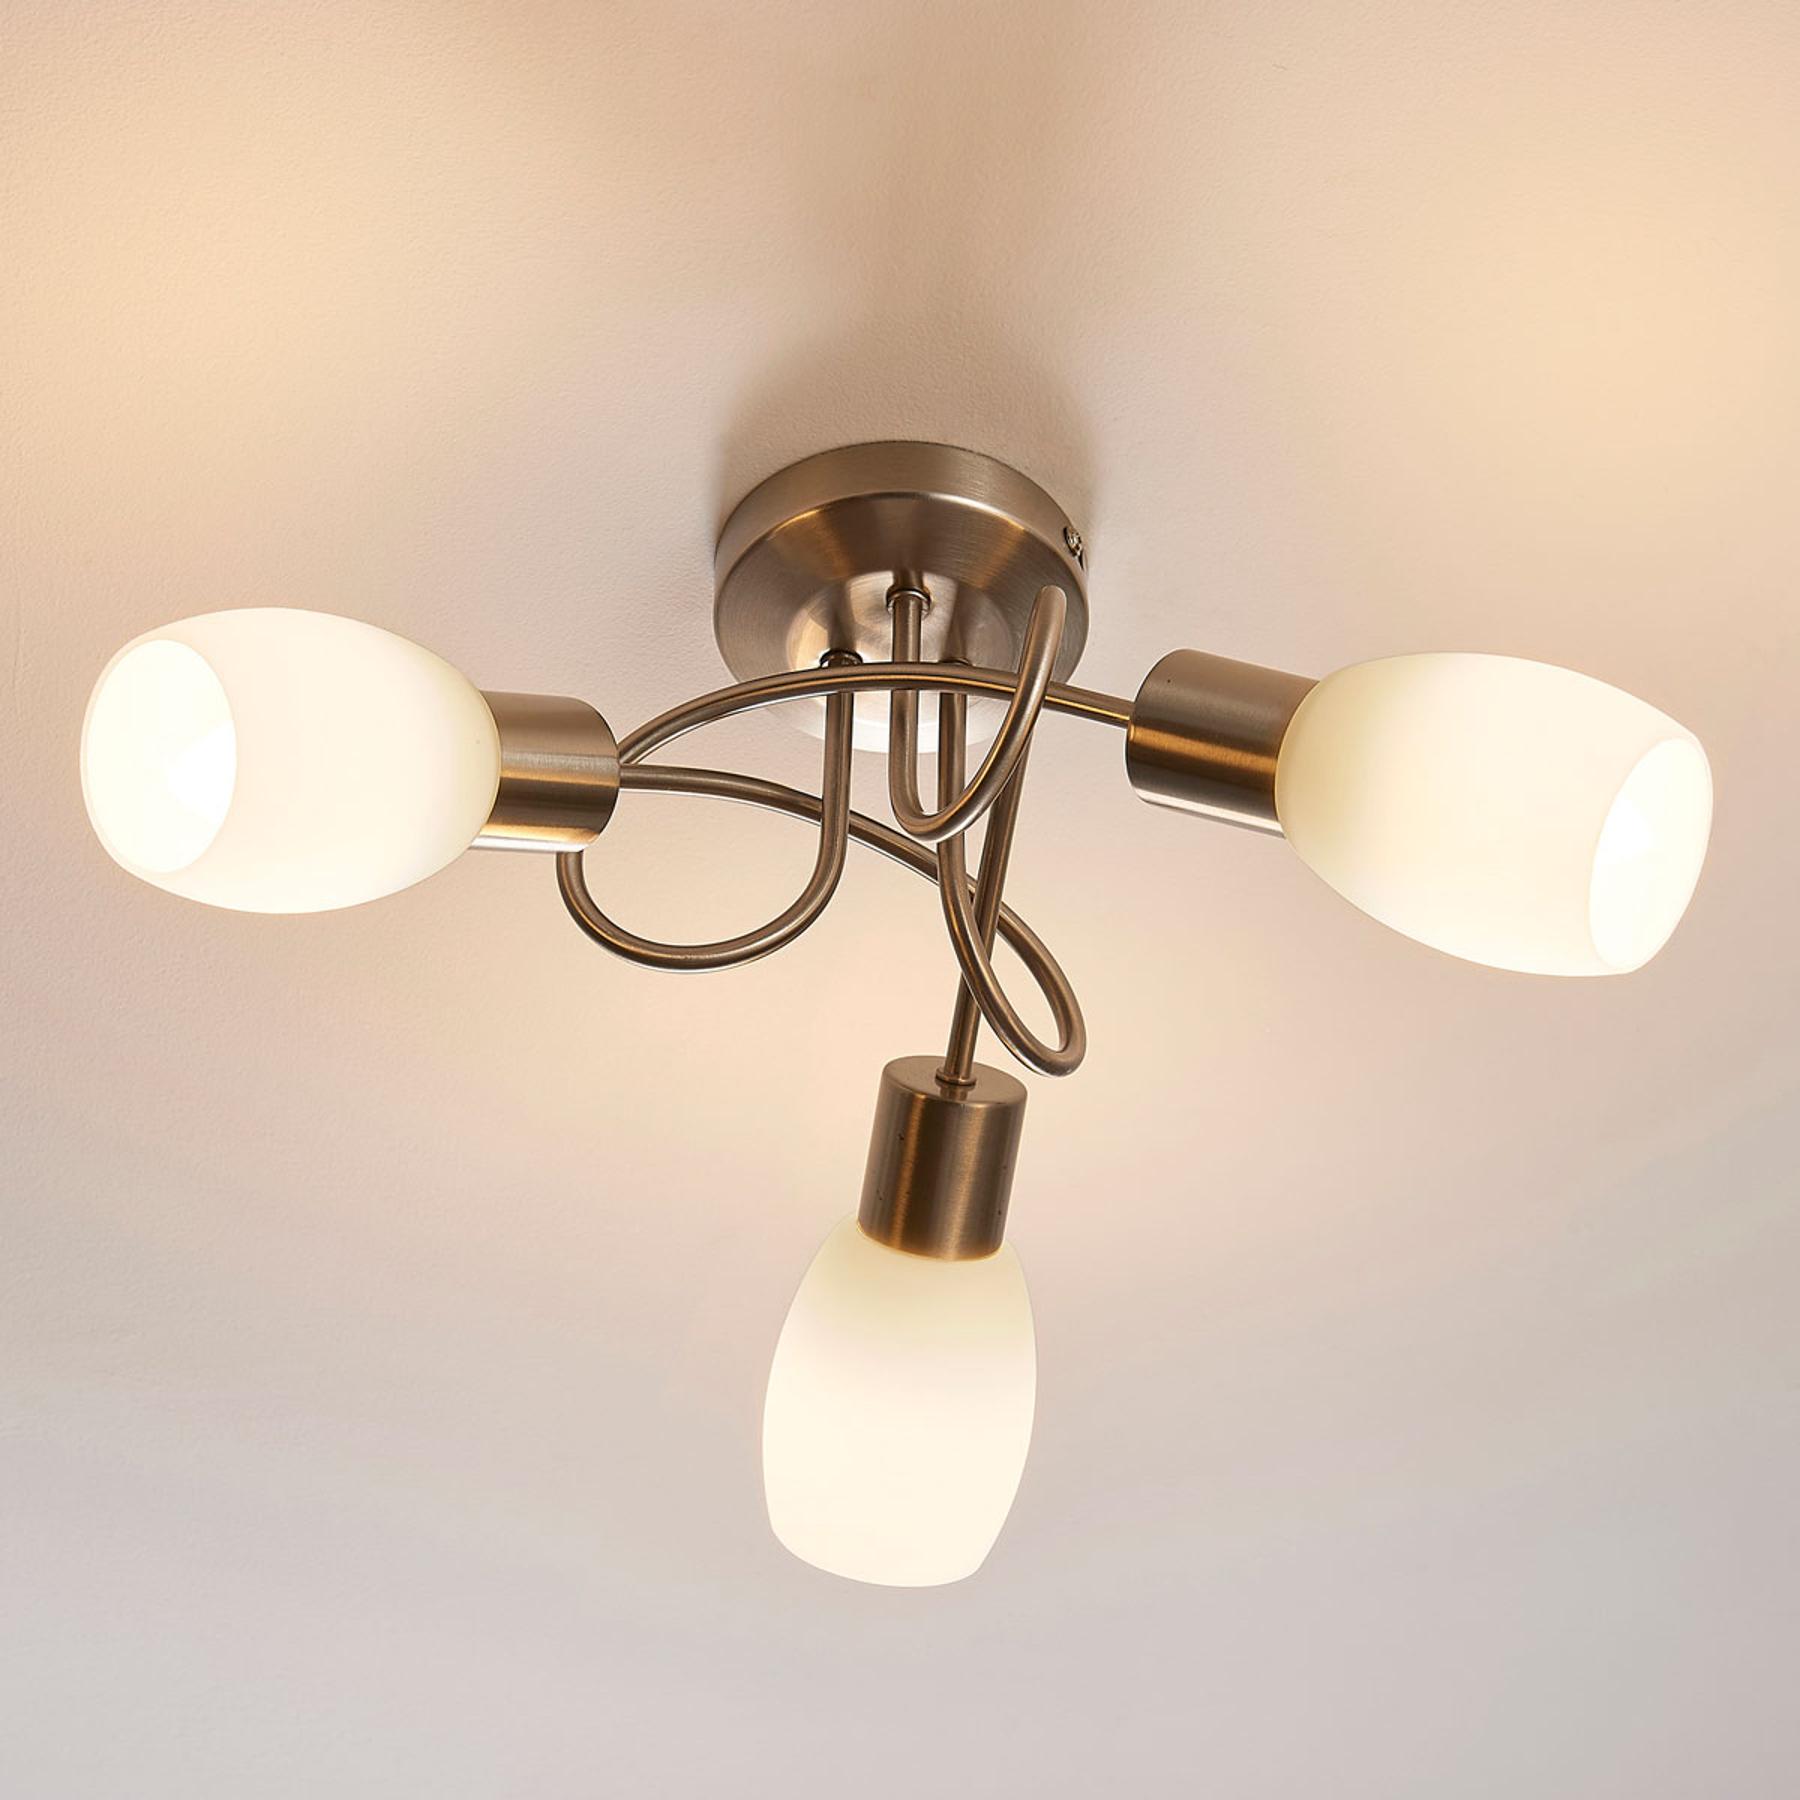 Atrakcyjna lampa sufitowa LED Arda, easydim